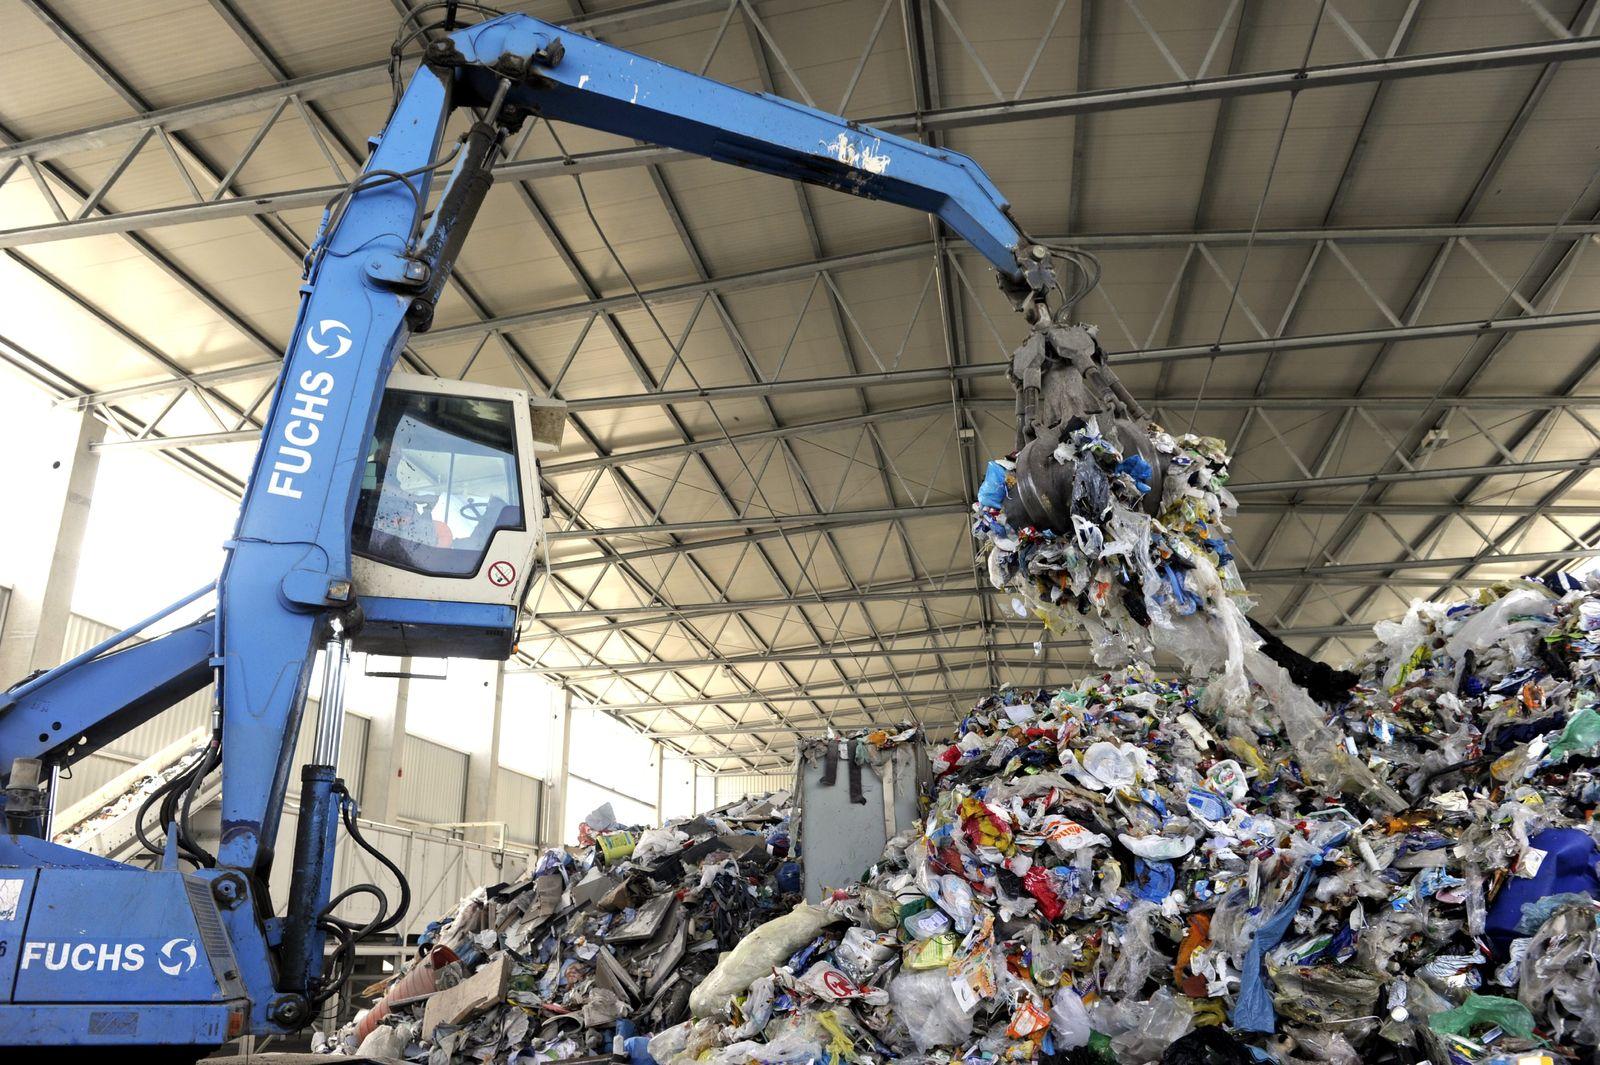 NICHT VERWENDEN Abfall / Müll / Recycling